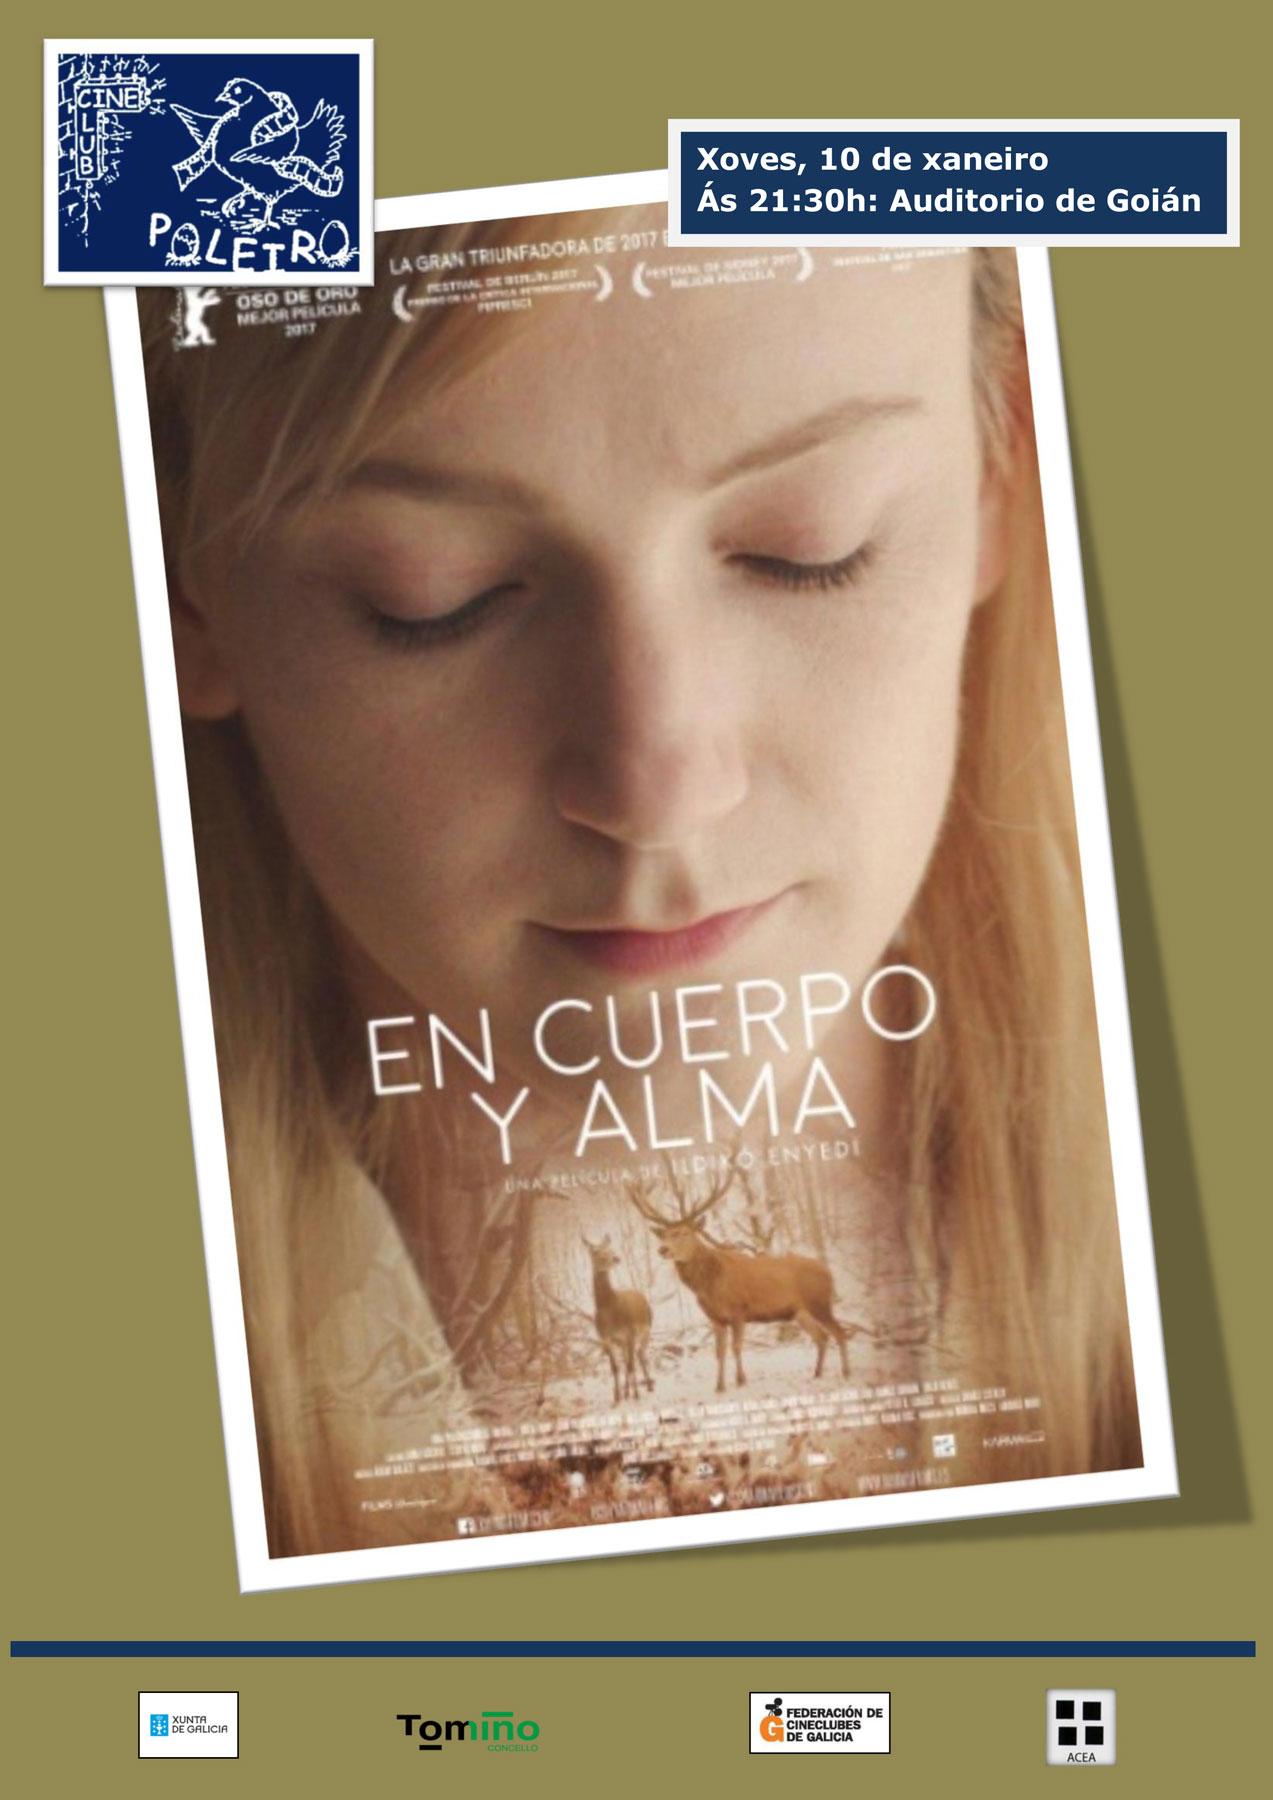 O Cineclub Poleiro proxecta 'En cuerpo y alma'